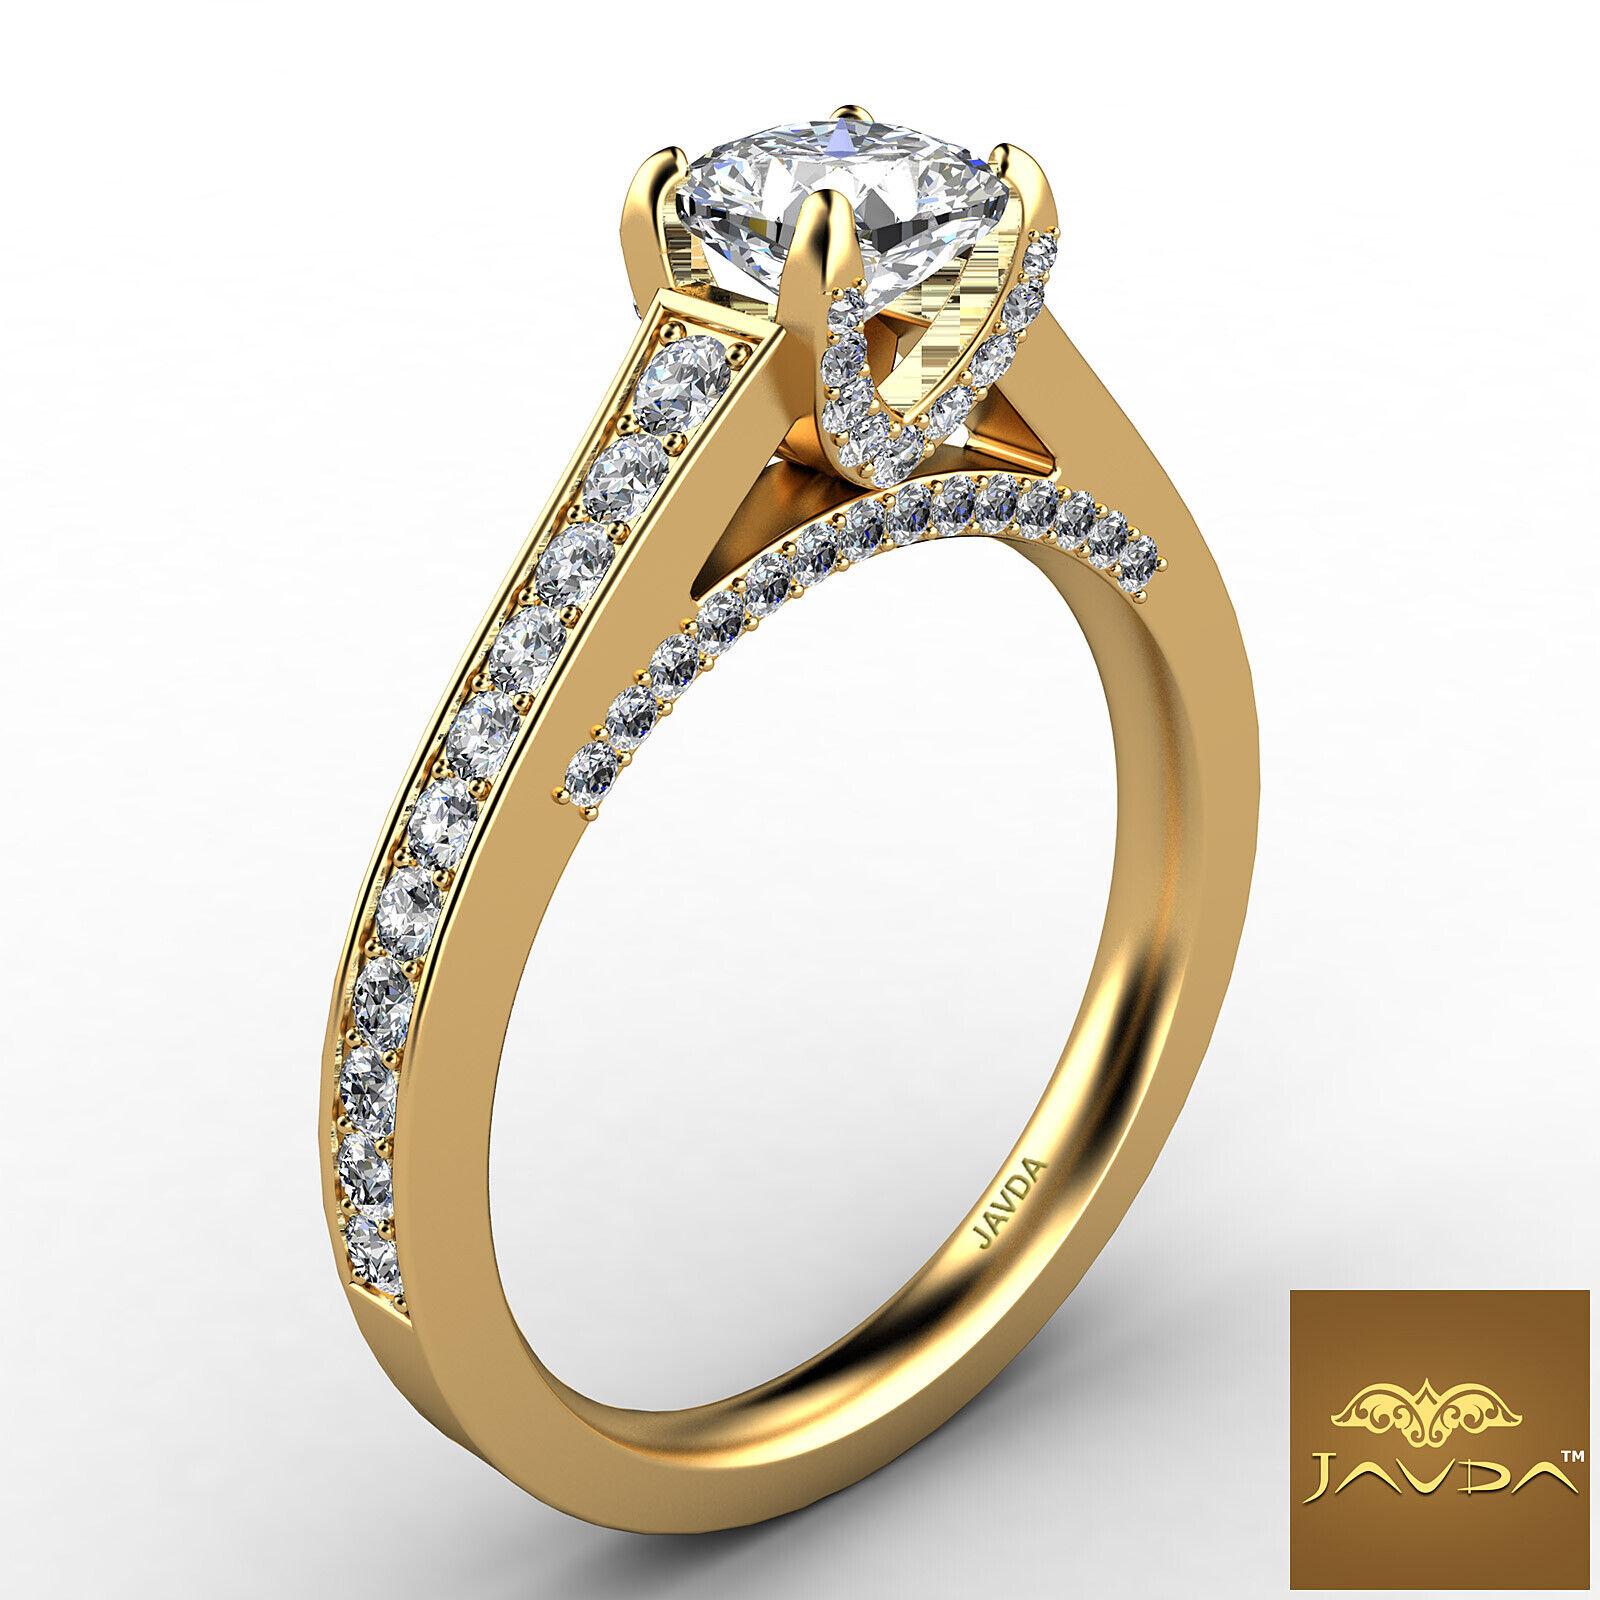 Cushion Cut Diamond Flawless Engagement GIA G VVS2 Pave Set Ring Platinum 1.25Ct 6